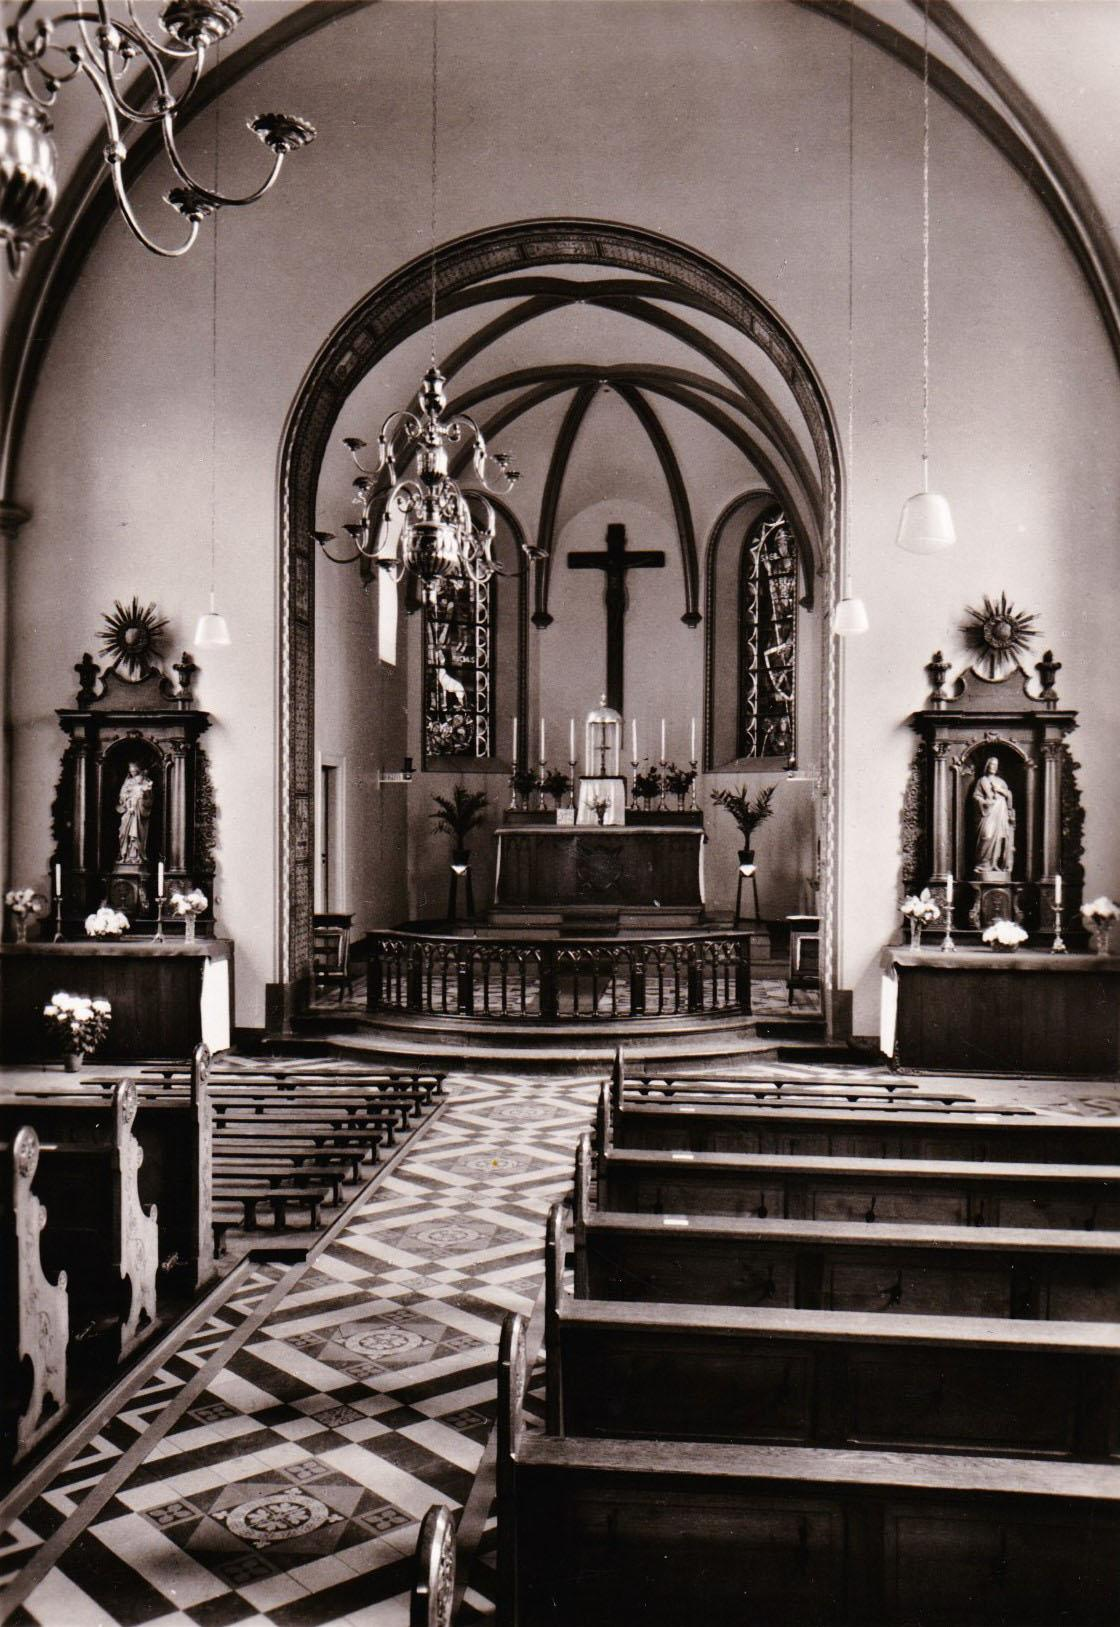 Katholische Kirche St. Rochus vor Anbau